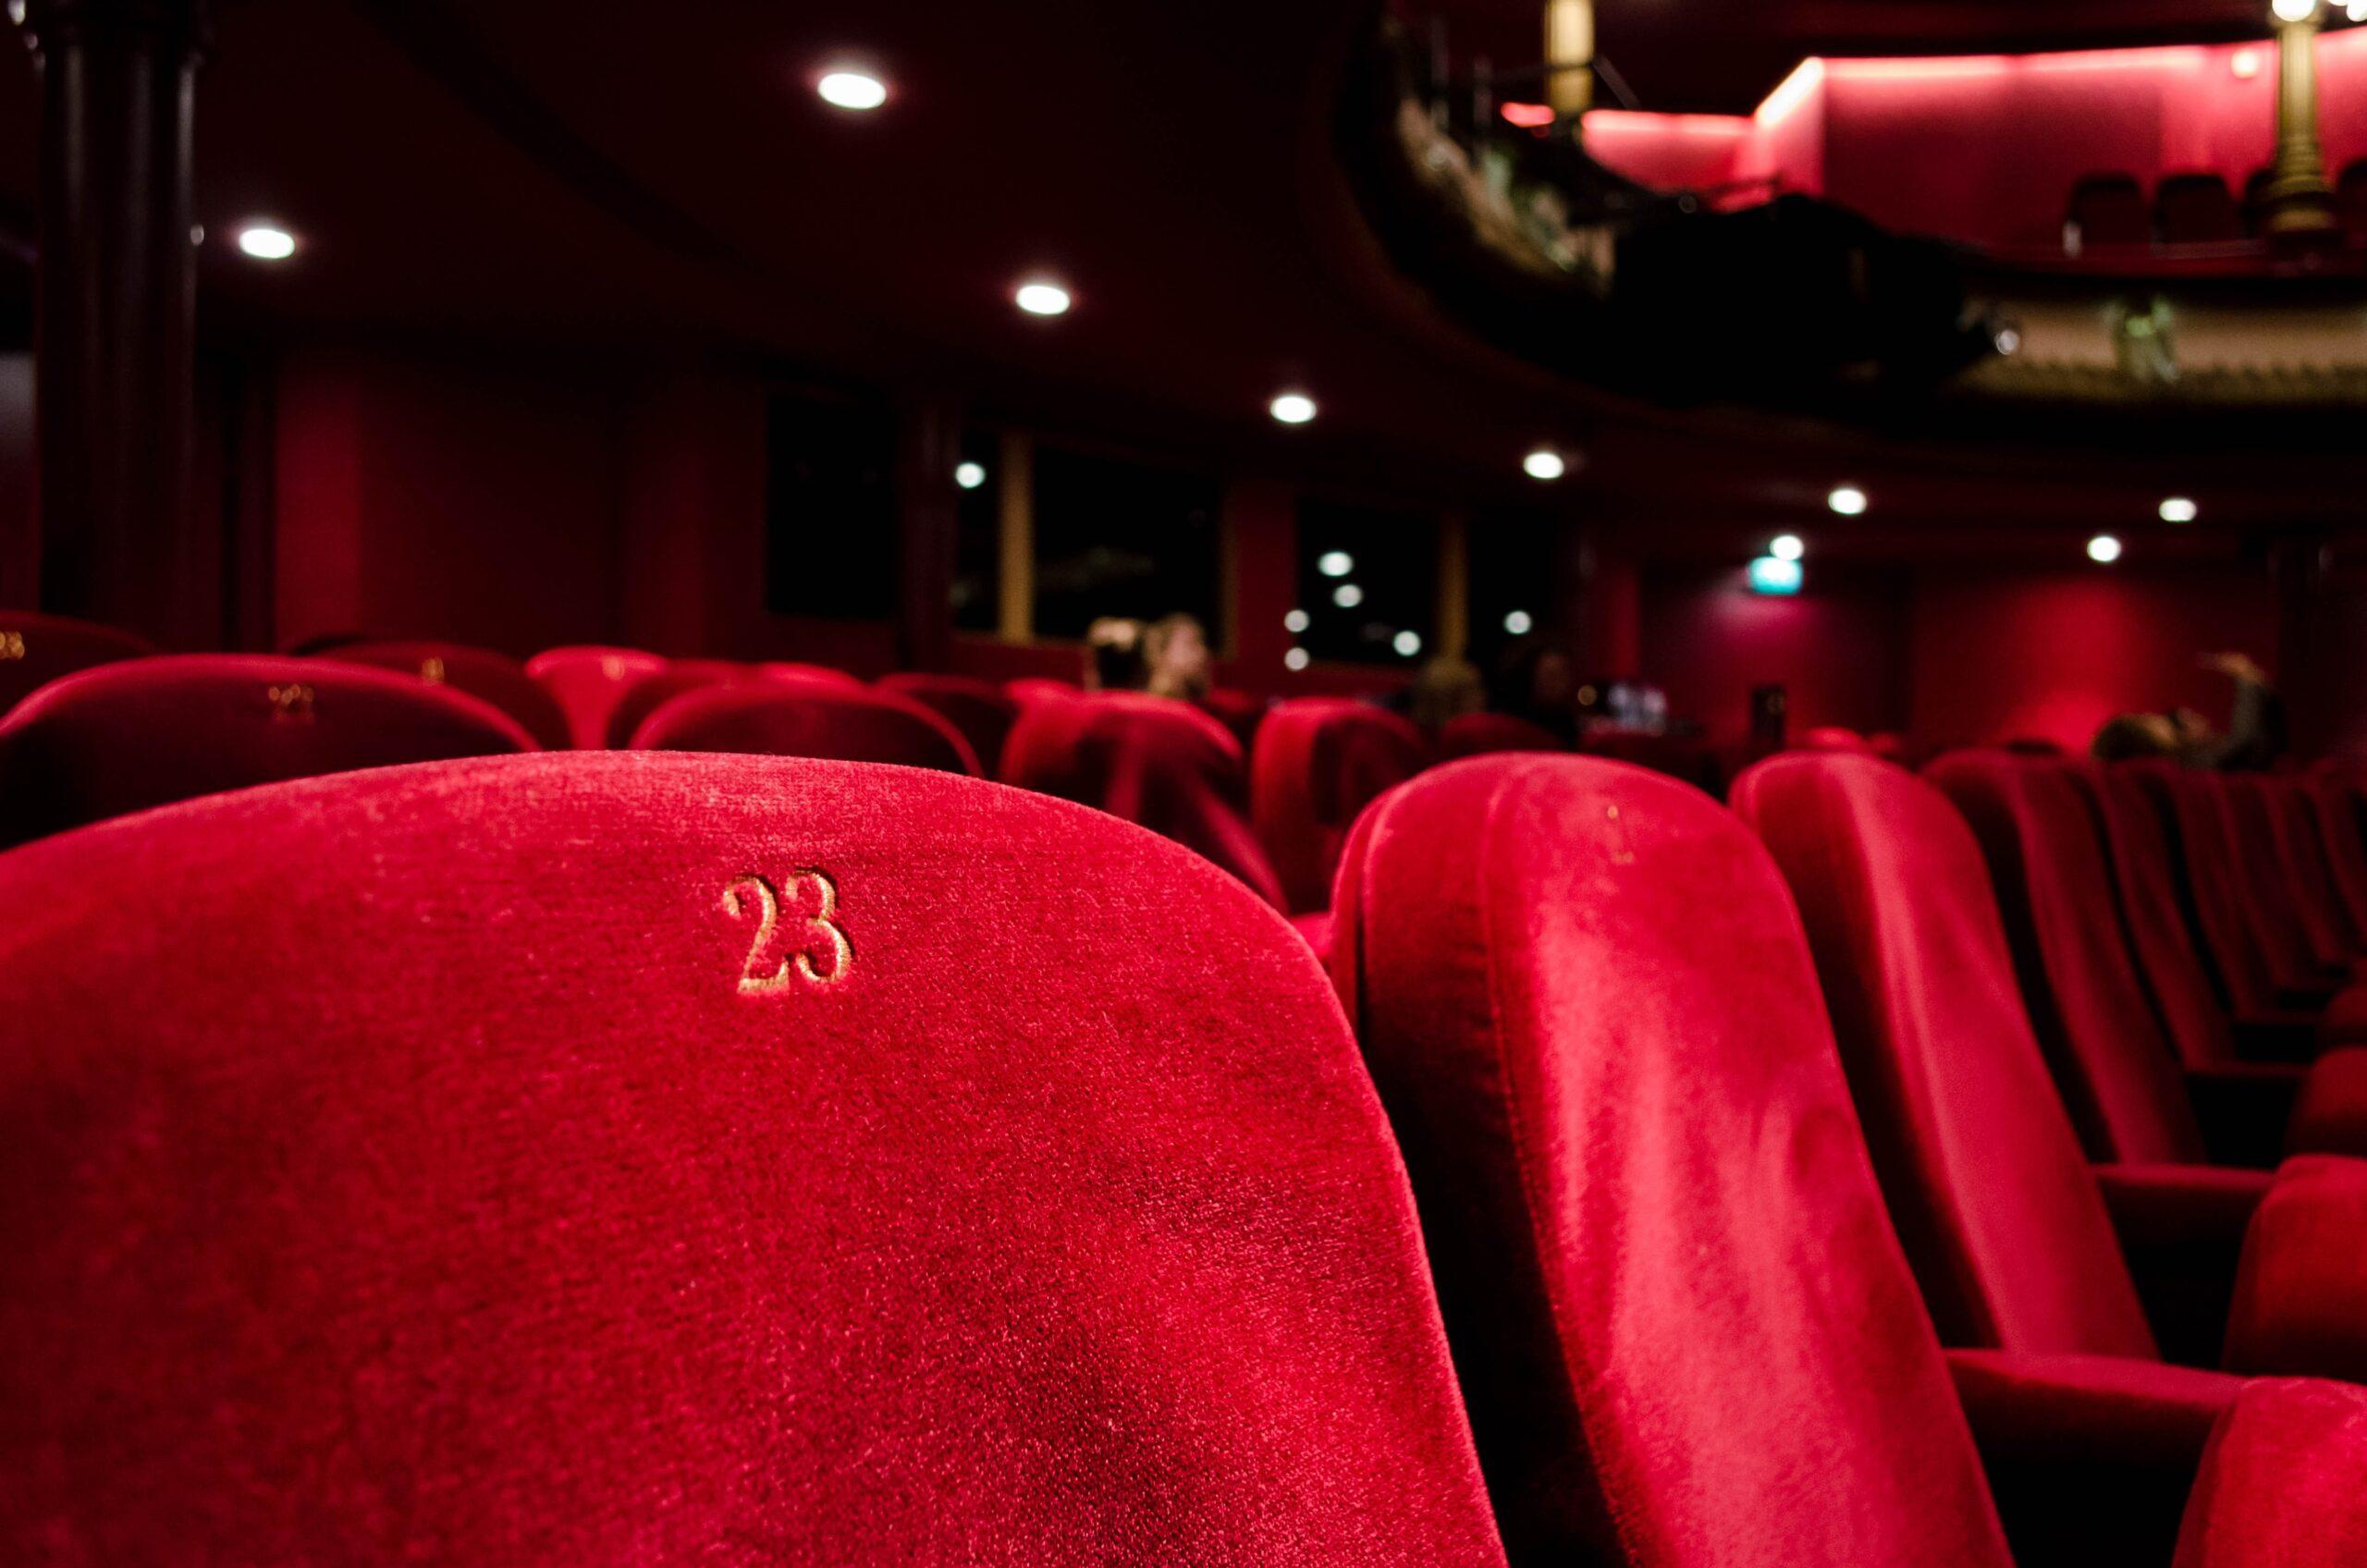 Plush red movie theatre seats